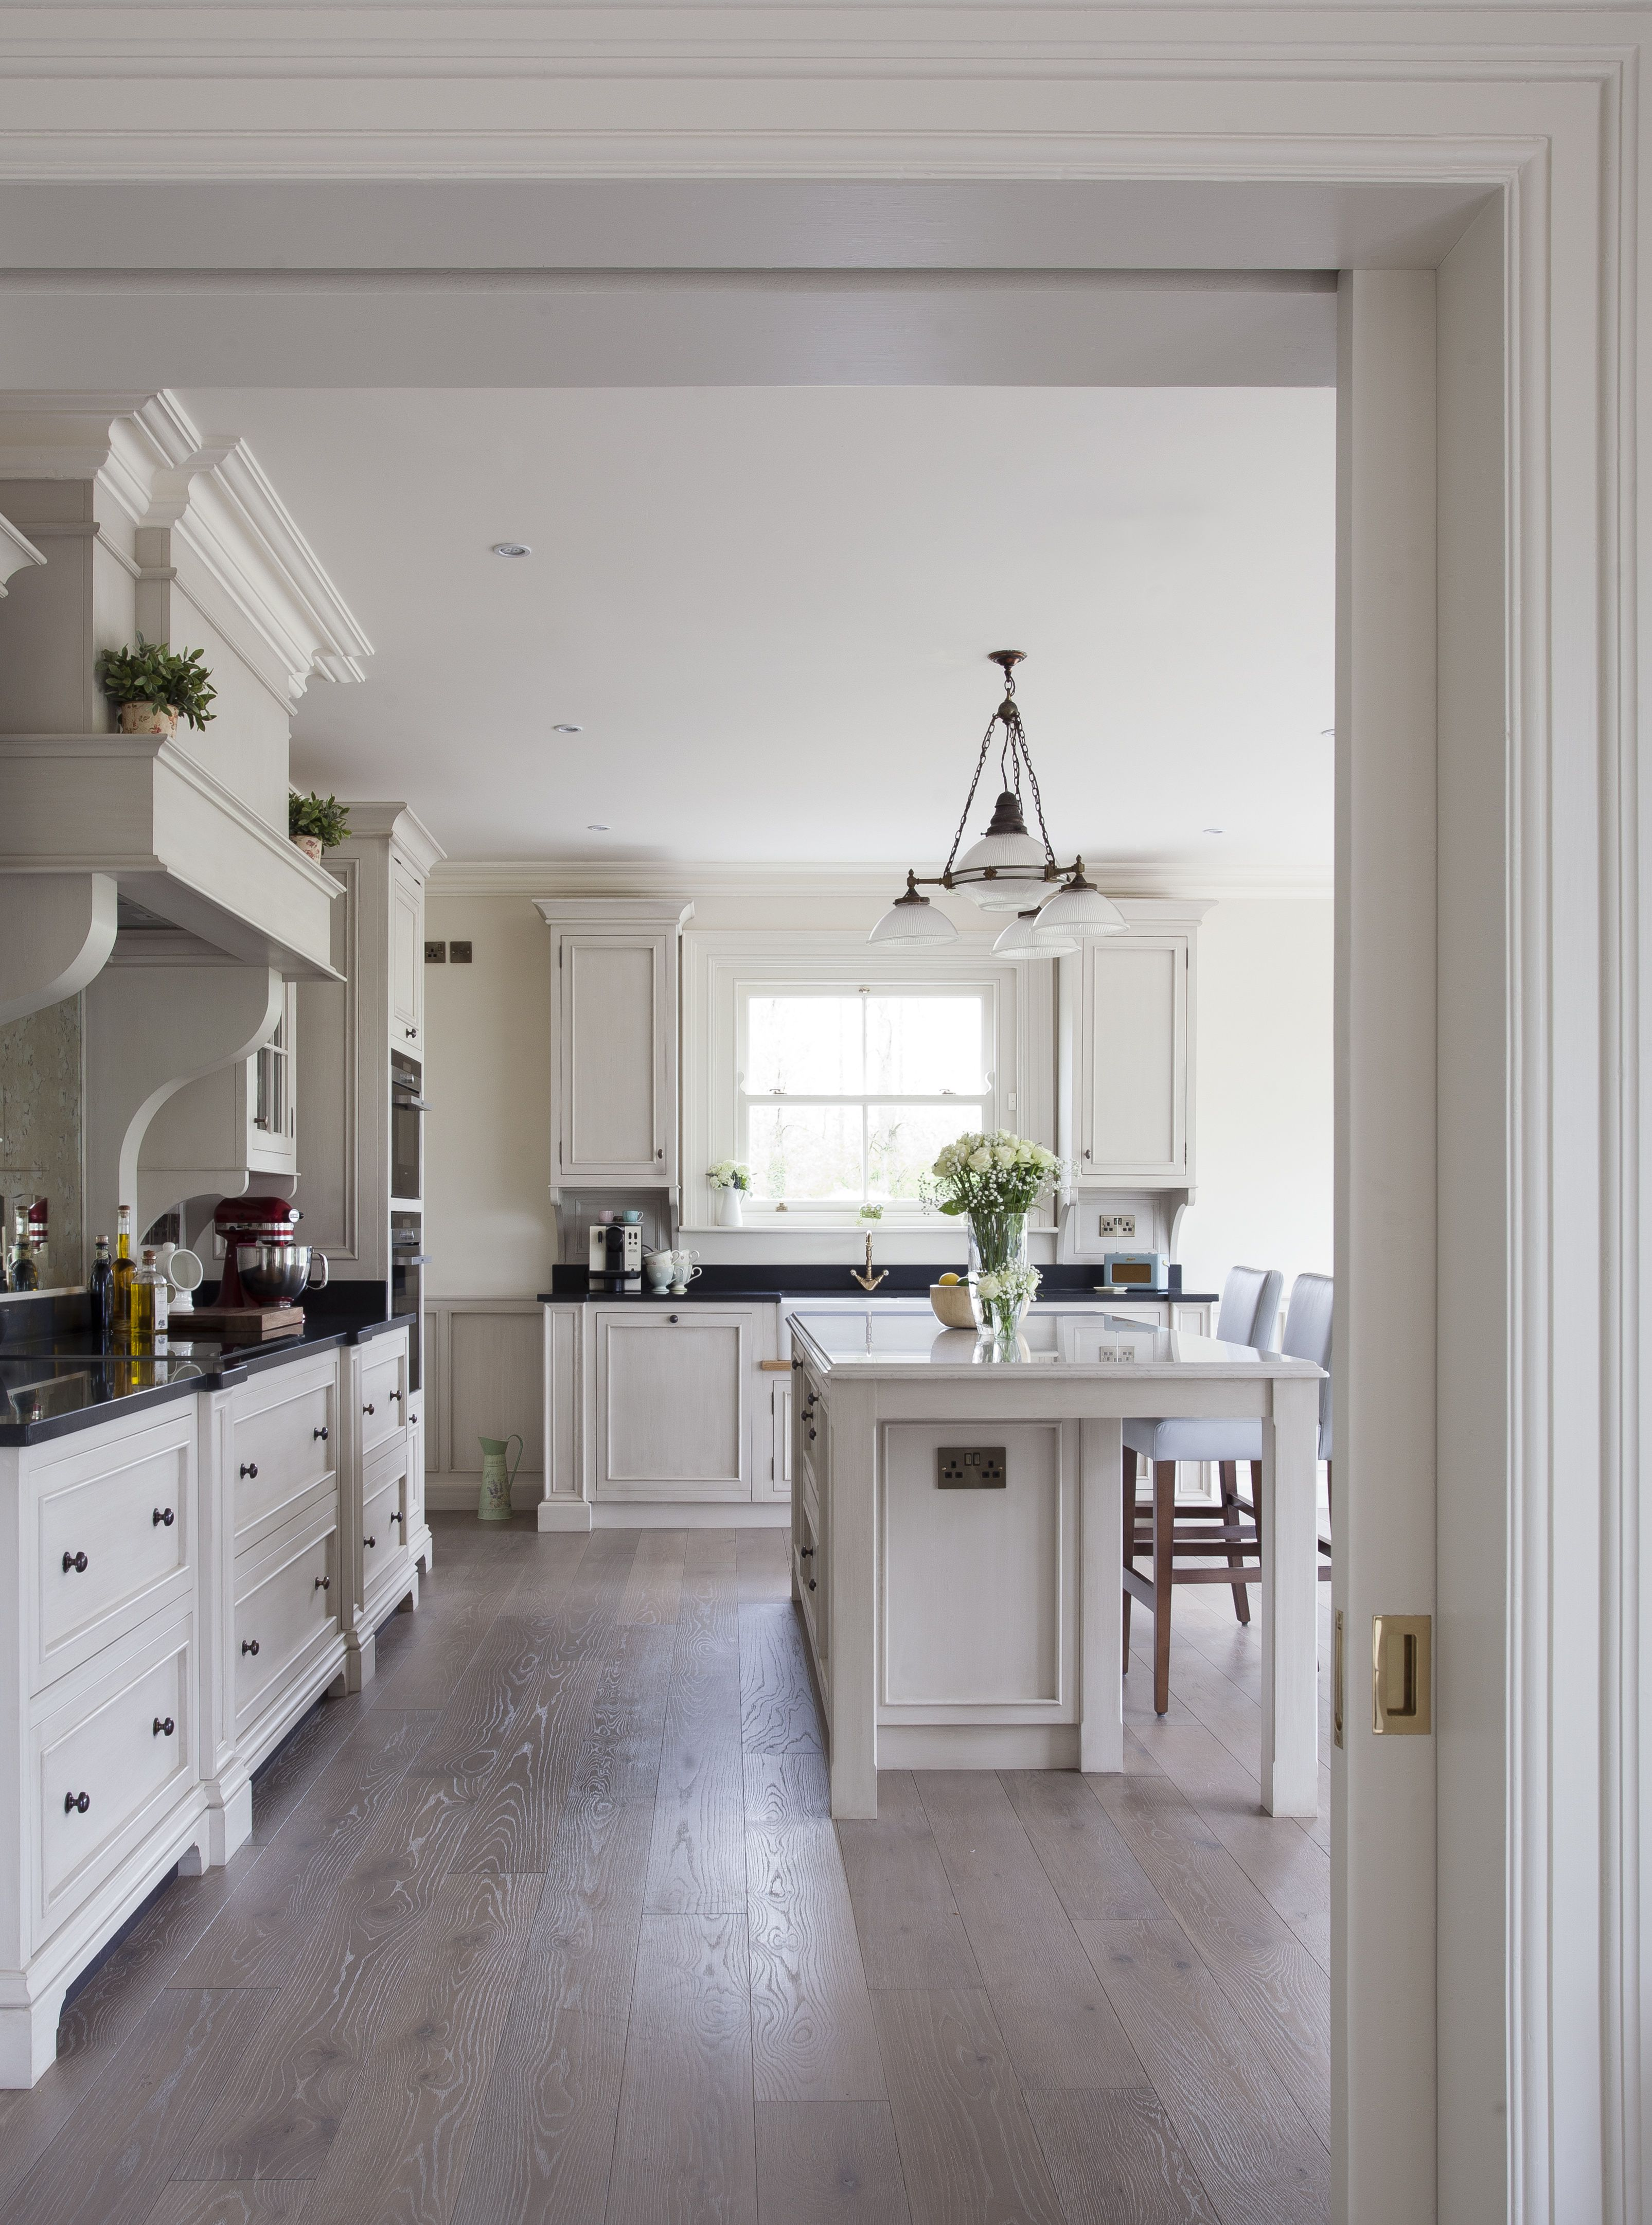 Modern Classic Kitchen Design: Contemporary Kitchen Design, Classic